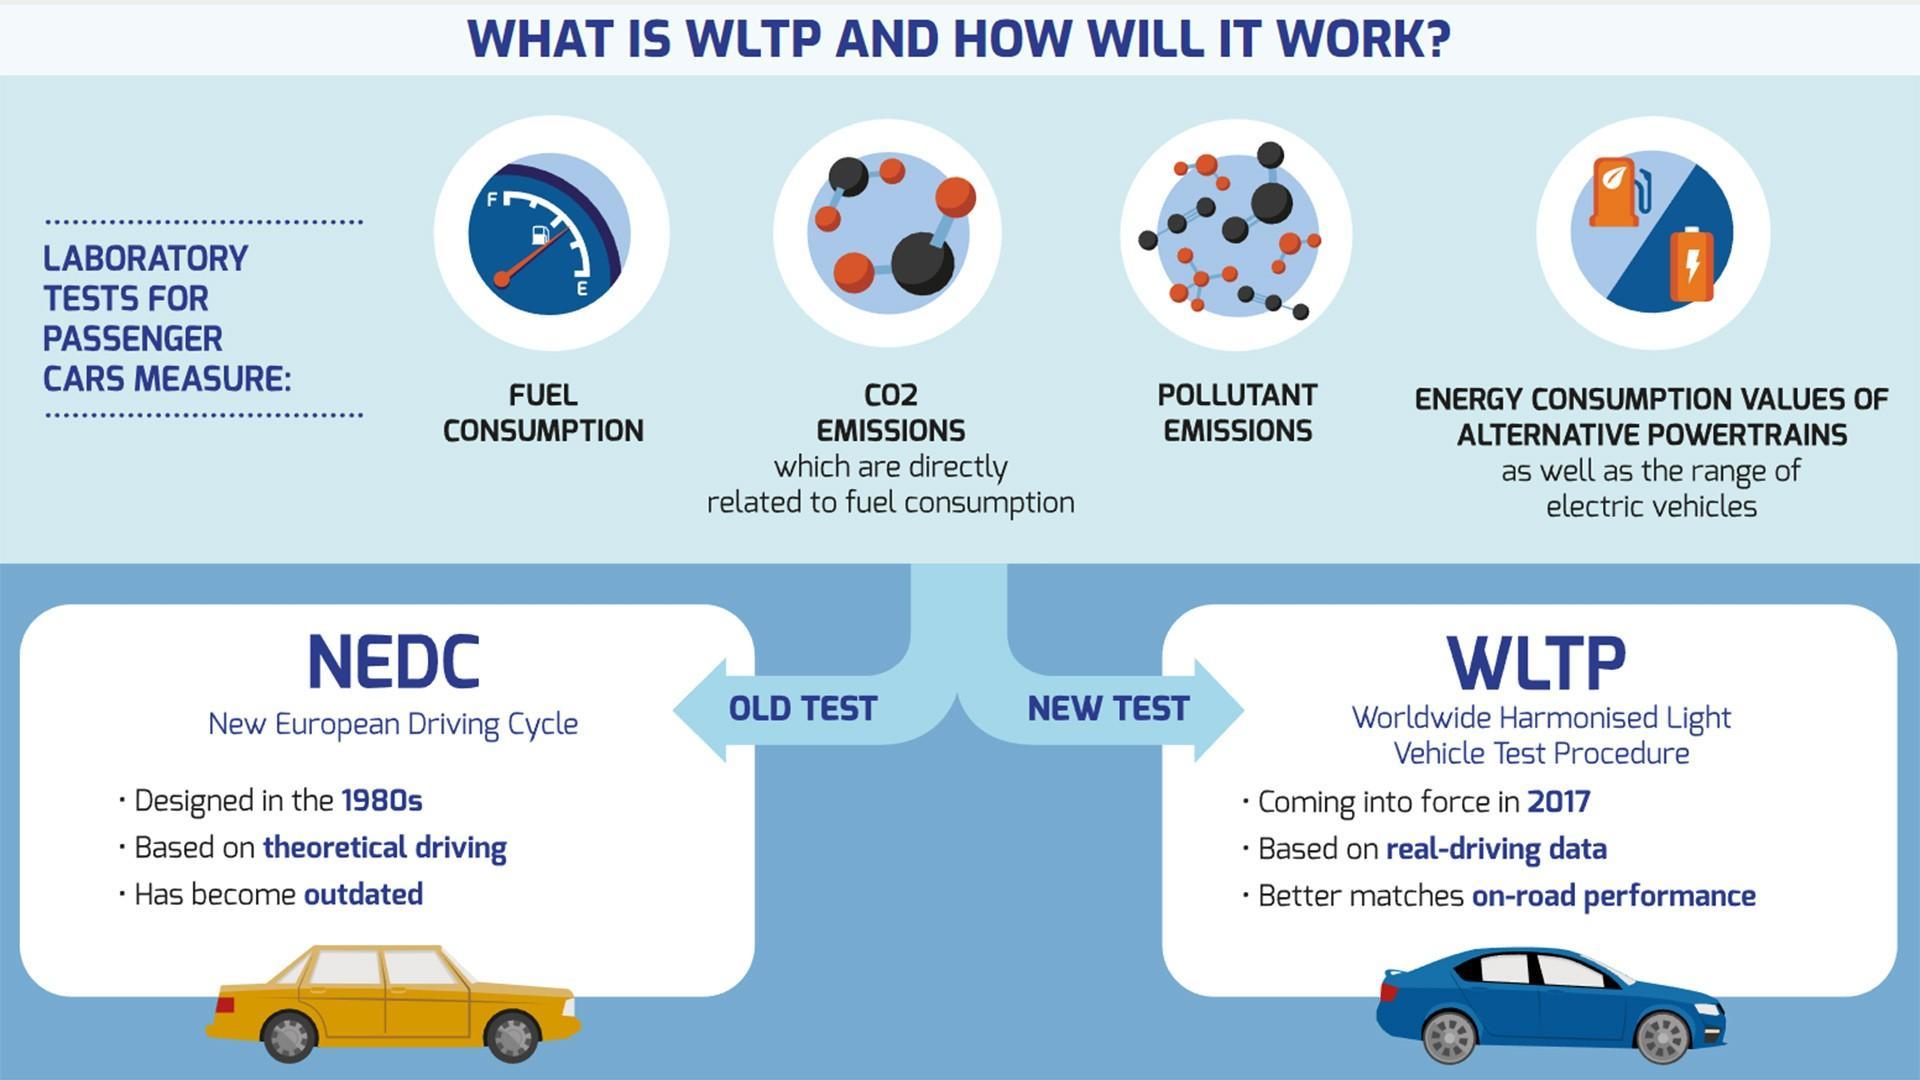 nuovi test consumi emissioni wltp wltc rde tecnologie per l 39 ambiente nell 39 auto autopareri. Black Bedroom Furniture Sets. Home Design Ideas